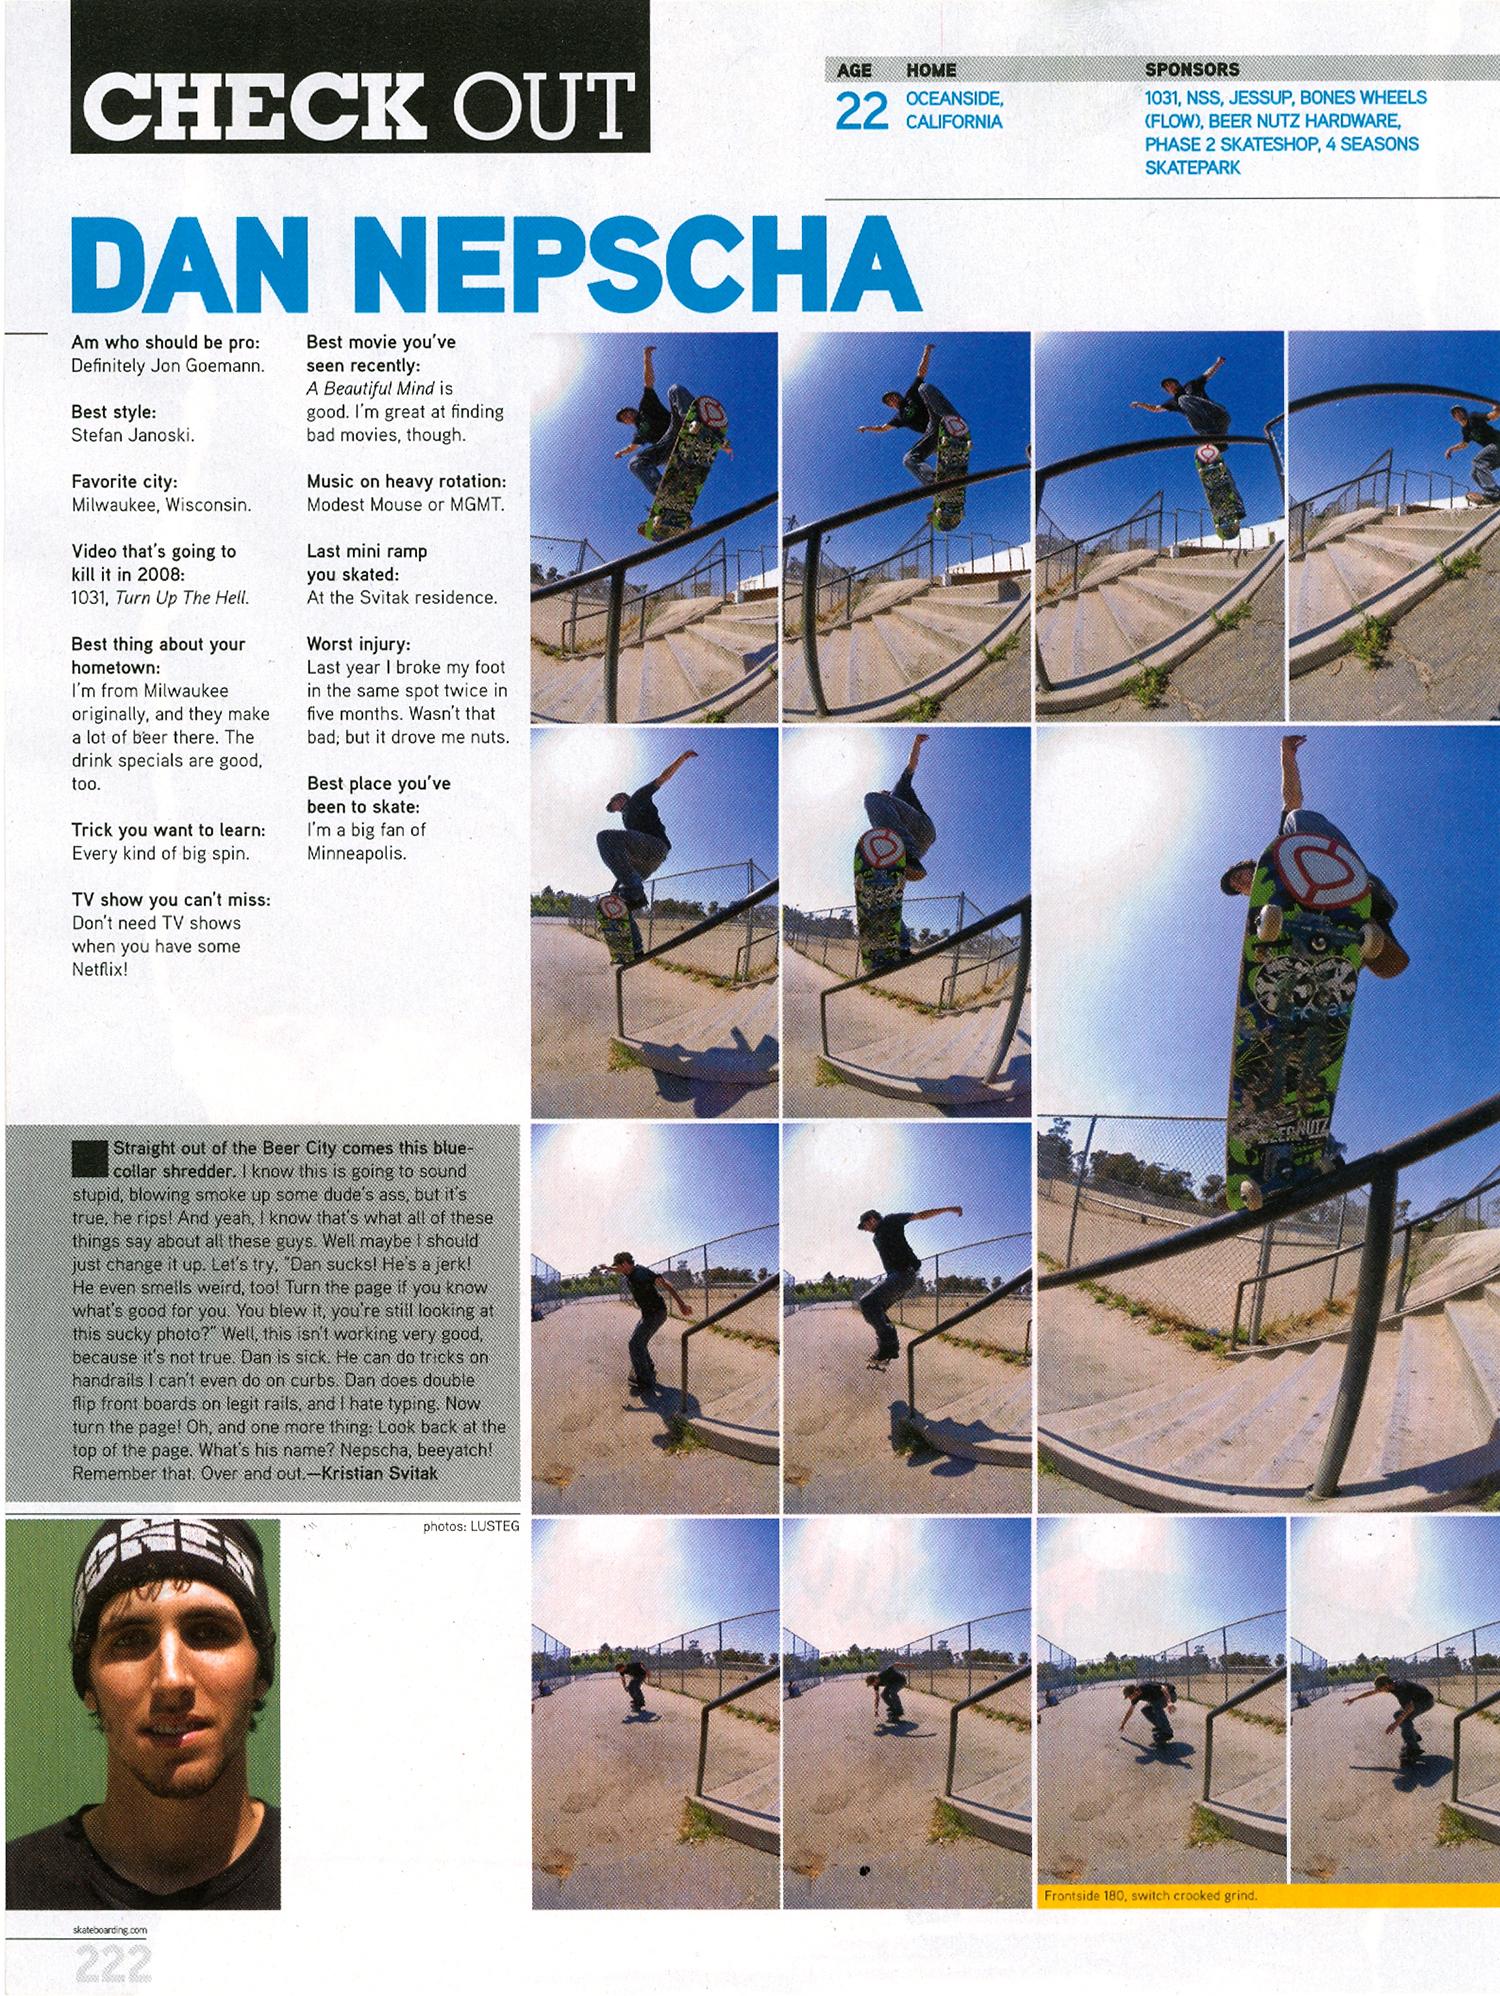 31_dan_nepscha_check_out_tws.jpg